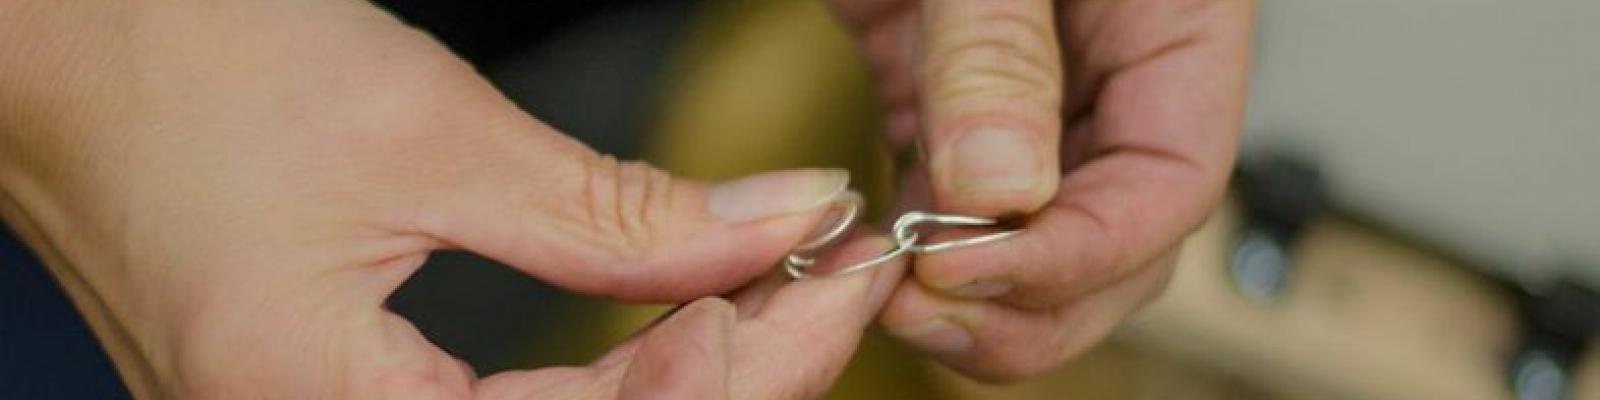 Hands making jewelry